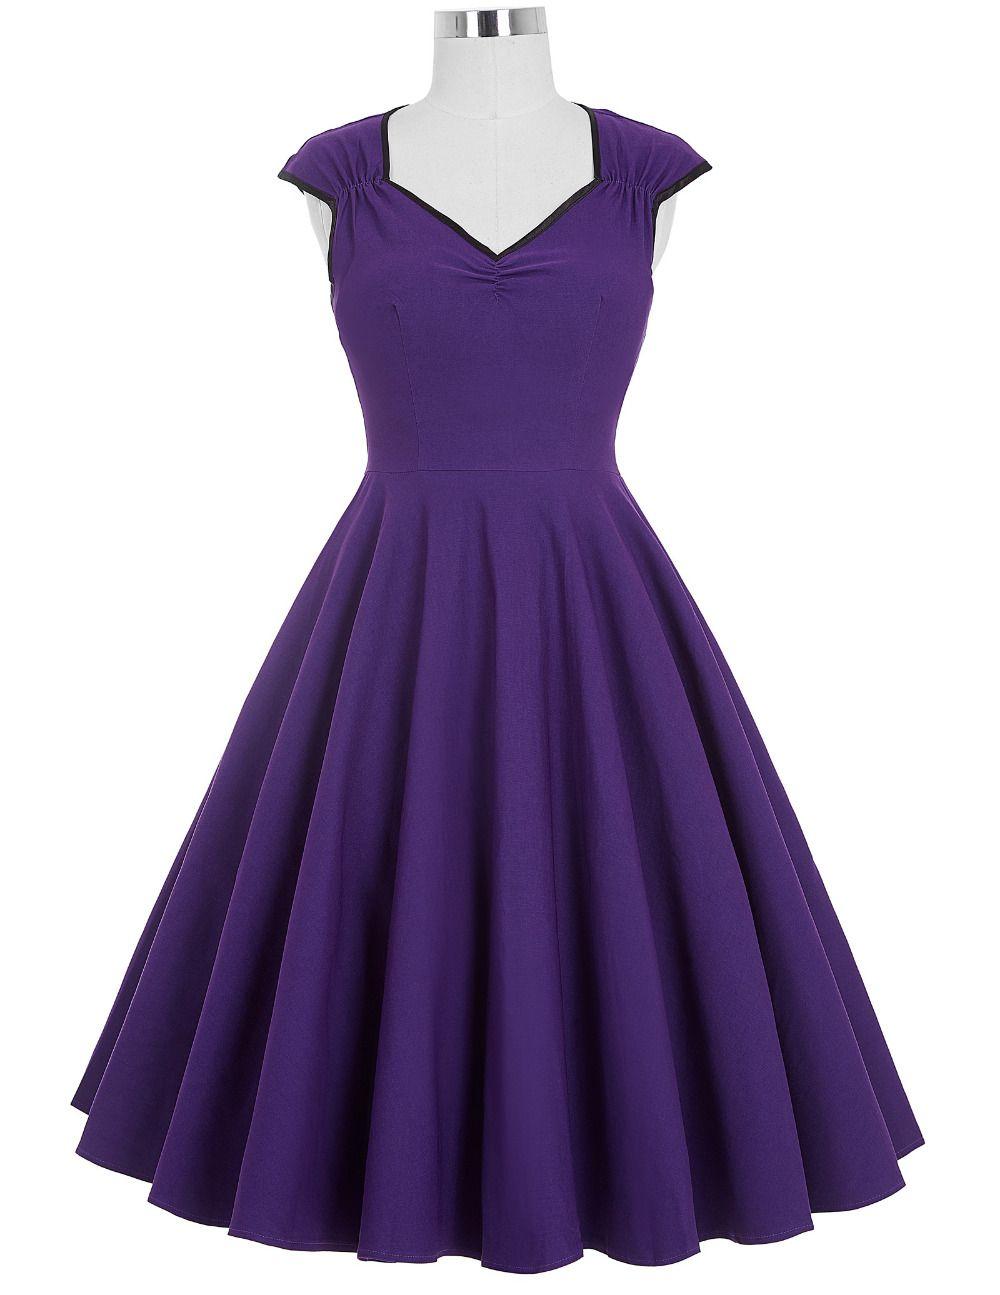 Find More Dresses Information about Women Dress 2016 Robe Vintage ...